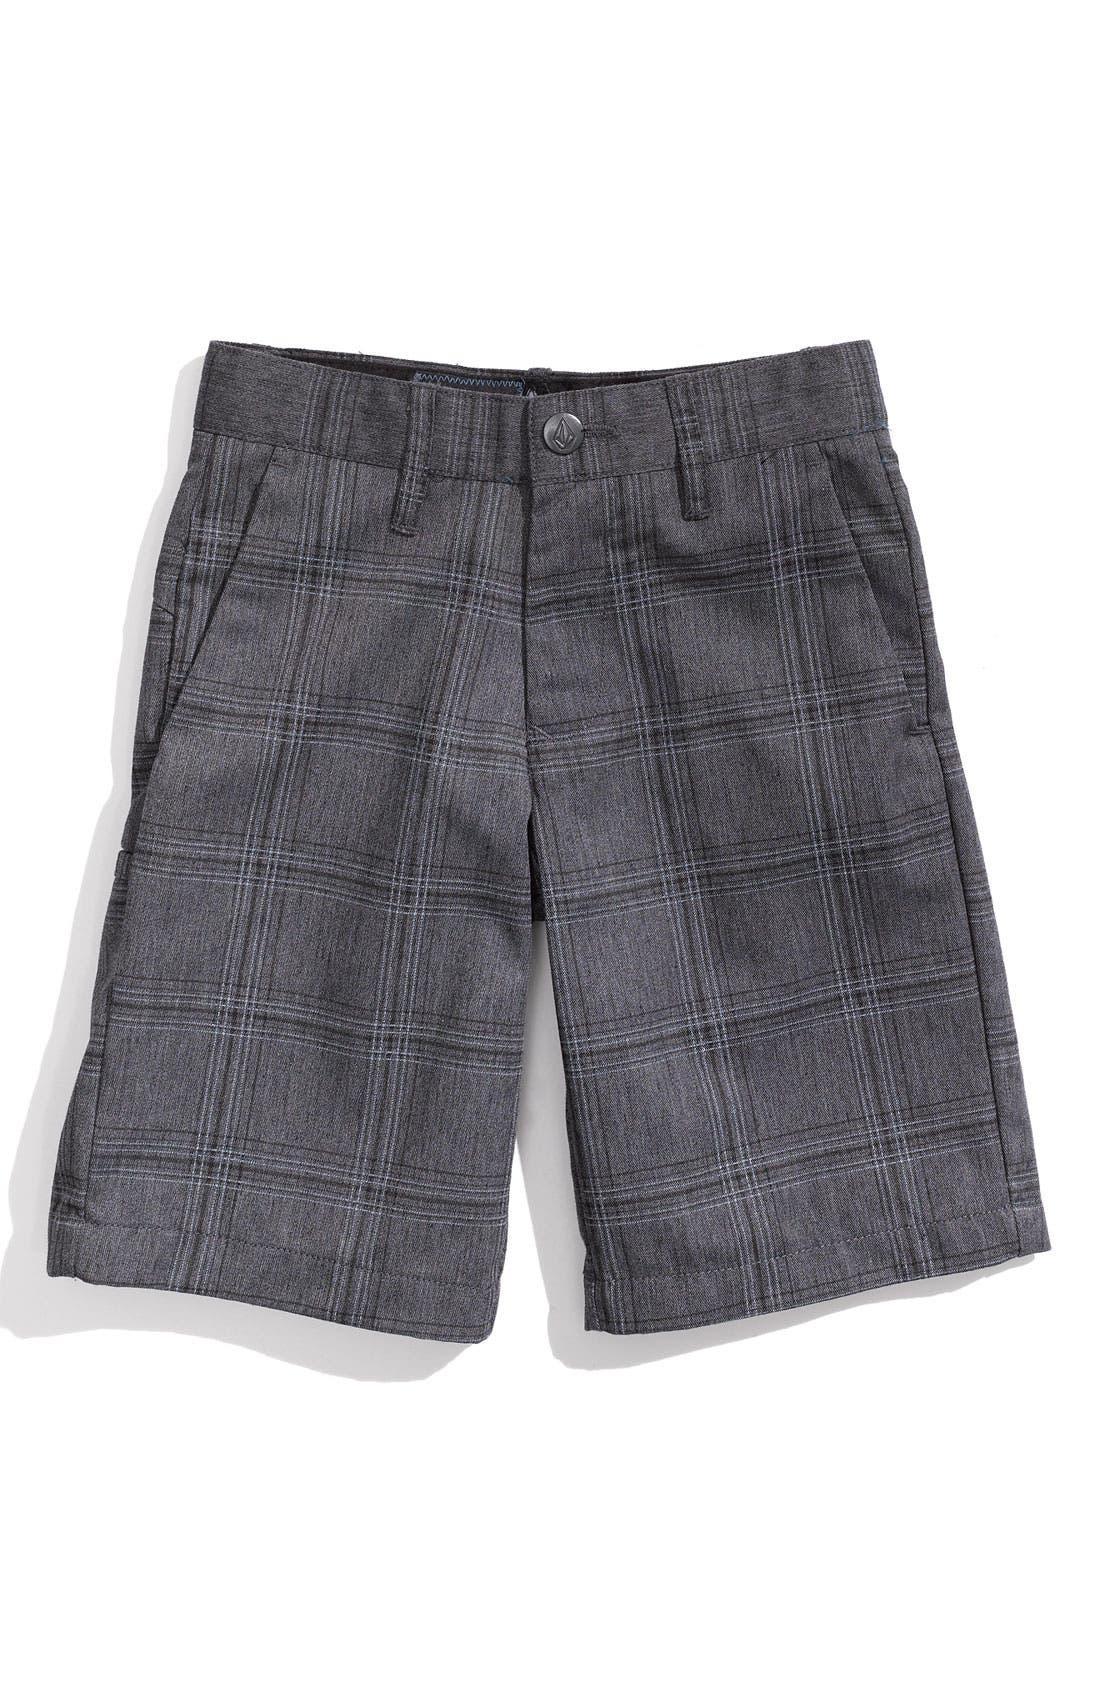 Alternate Image 1 Selected - Volcom Modern Plaid Shorts (Little Boys)